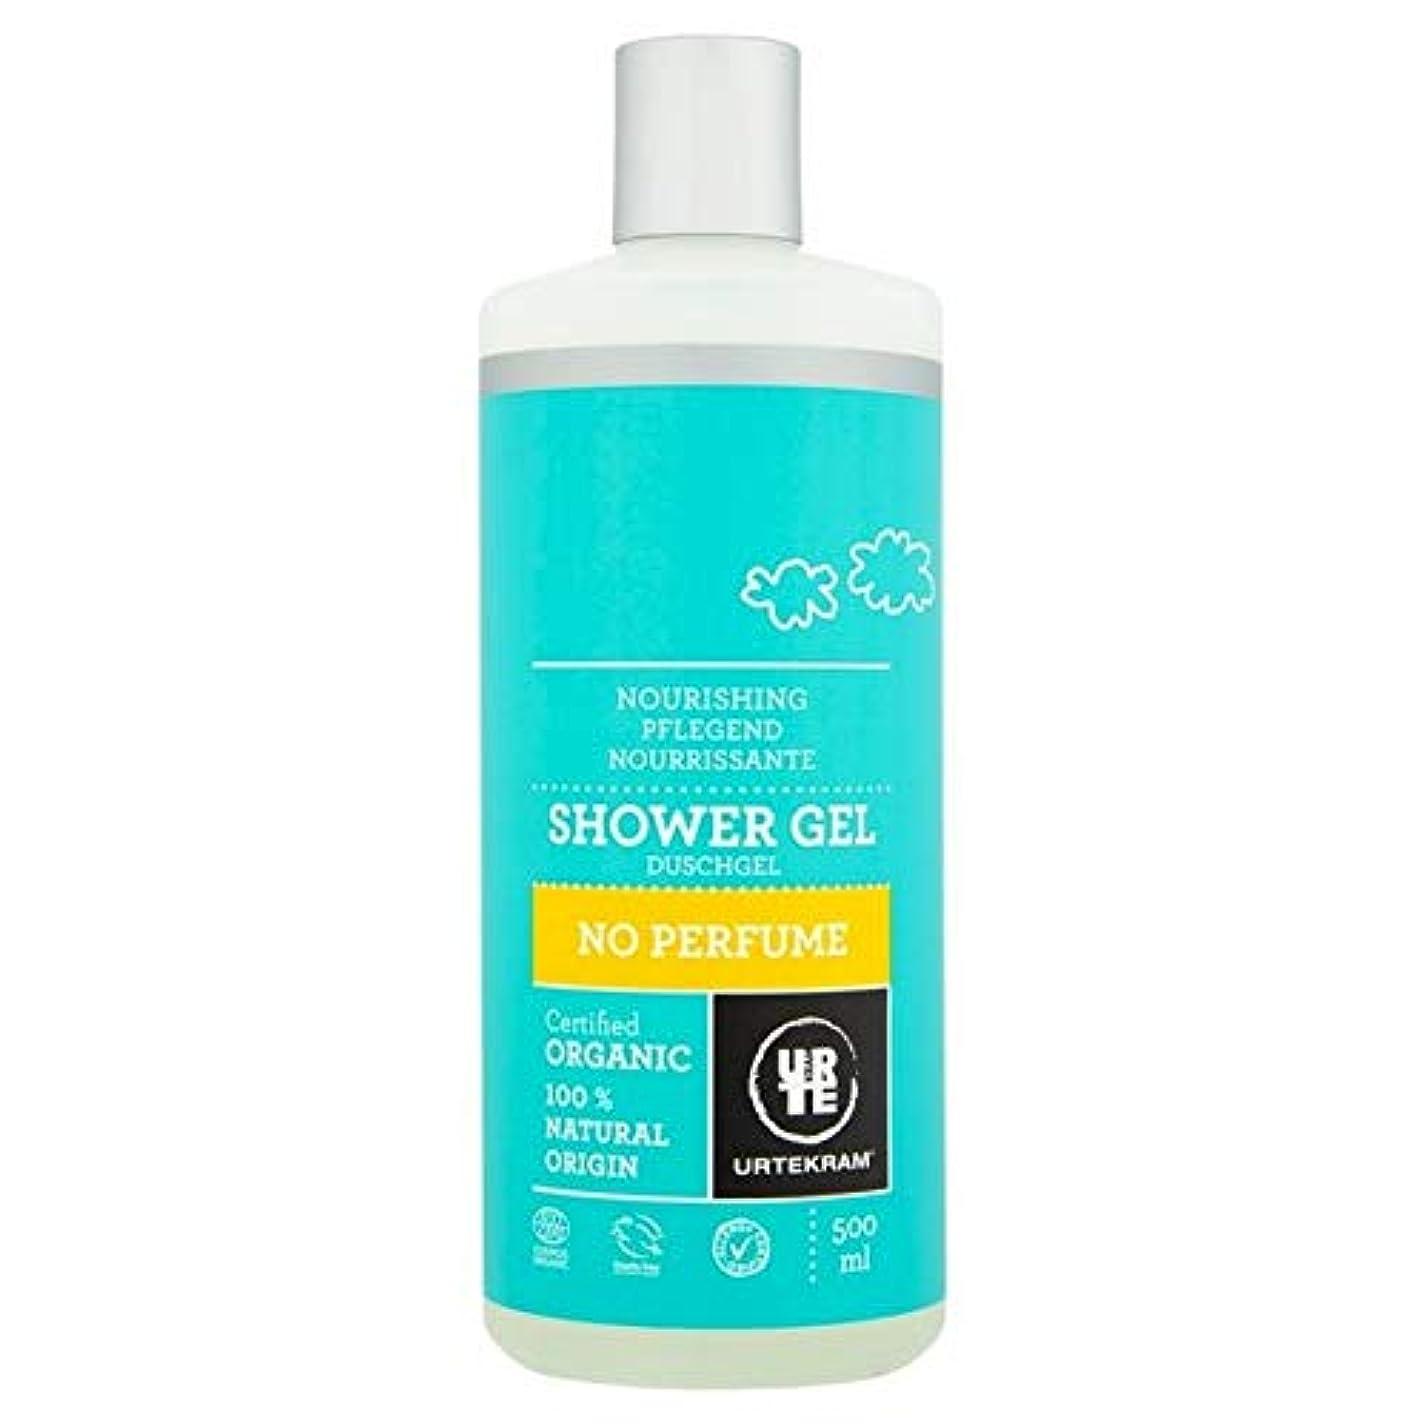 [Urtekram] 何の香水シャワージェル500ミリリットルをUrtekramありません - Urtekram No Perfume Shower Gel 500ml [並行輸入品]